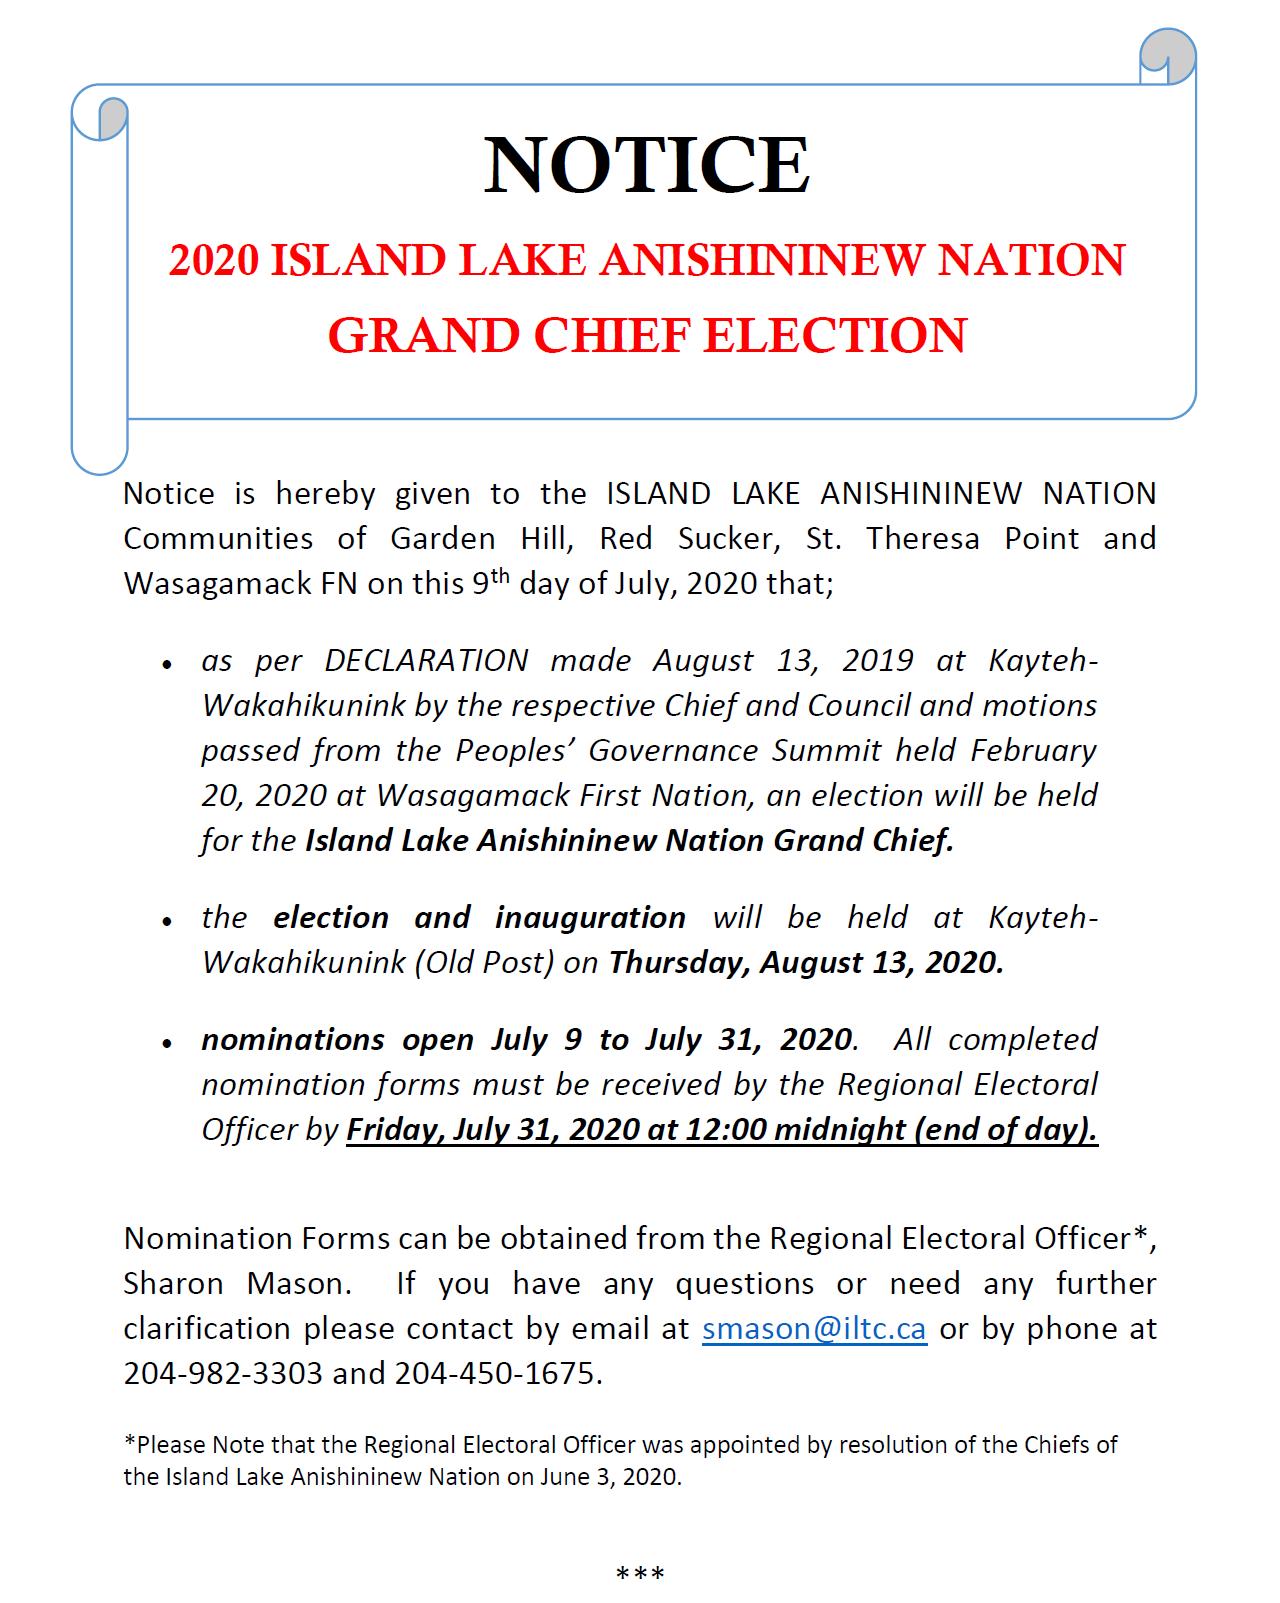 NOTICE: 2020 Island Lake Anishininew Nation Grand Chief Election